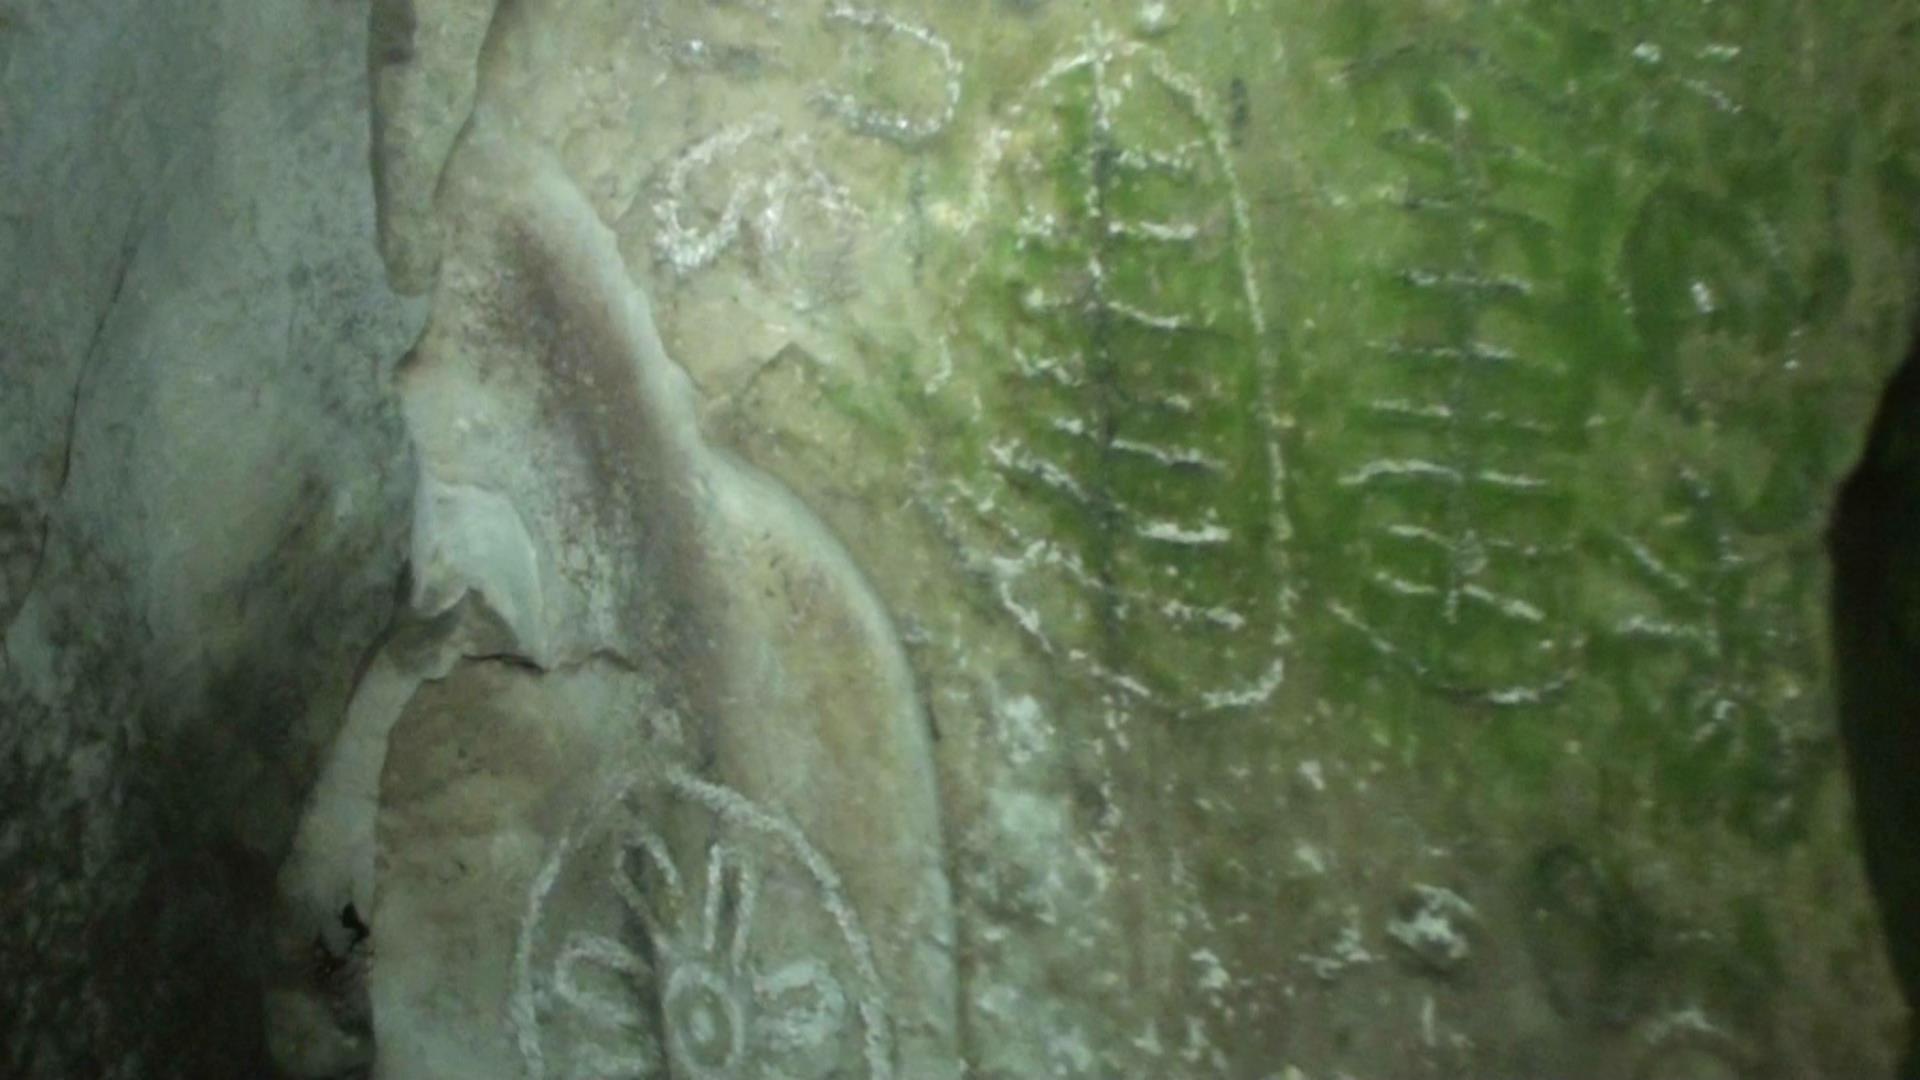 Carvings inside Cairn T